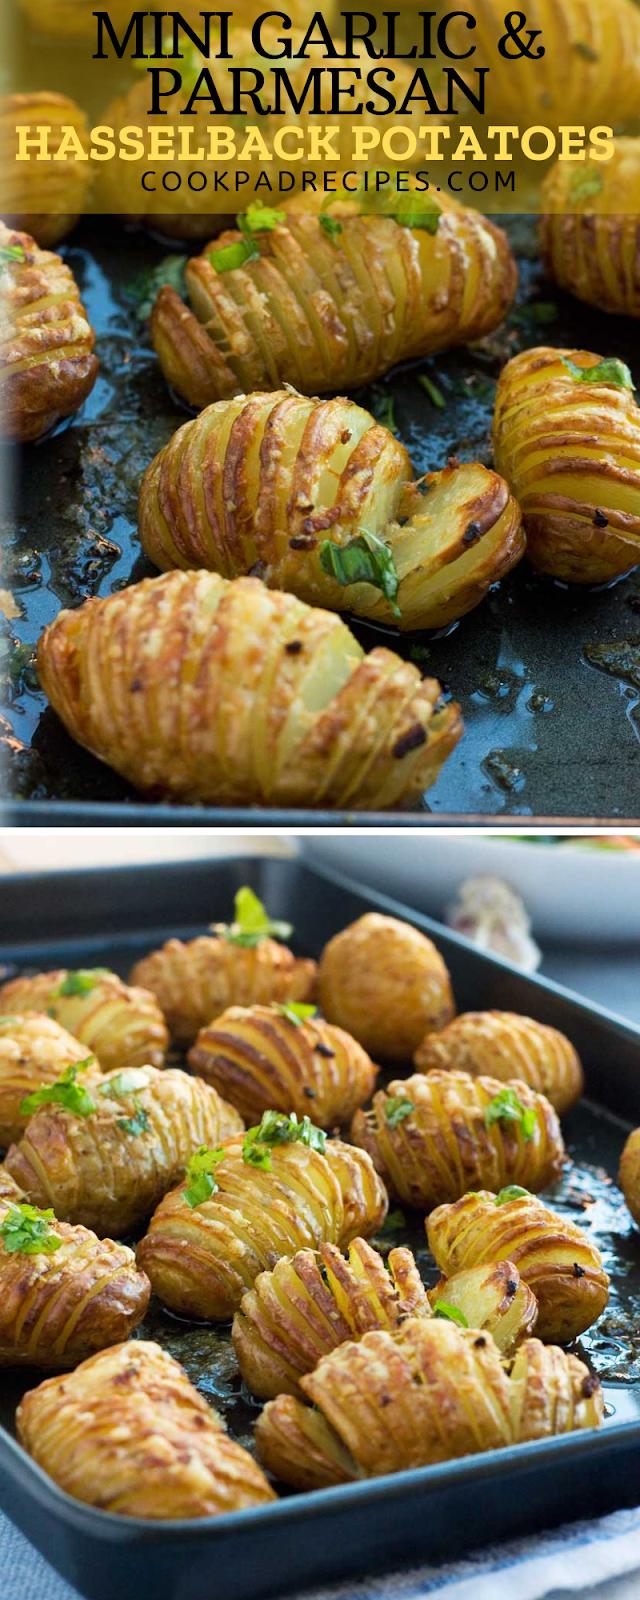 mini garlic & раrmеѕаn hаѕѕеlbасk роtаtоеѕ